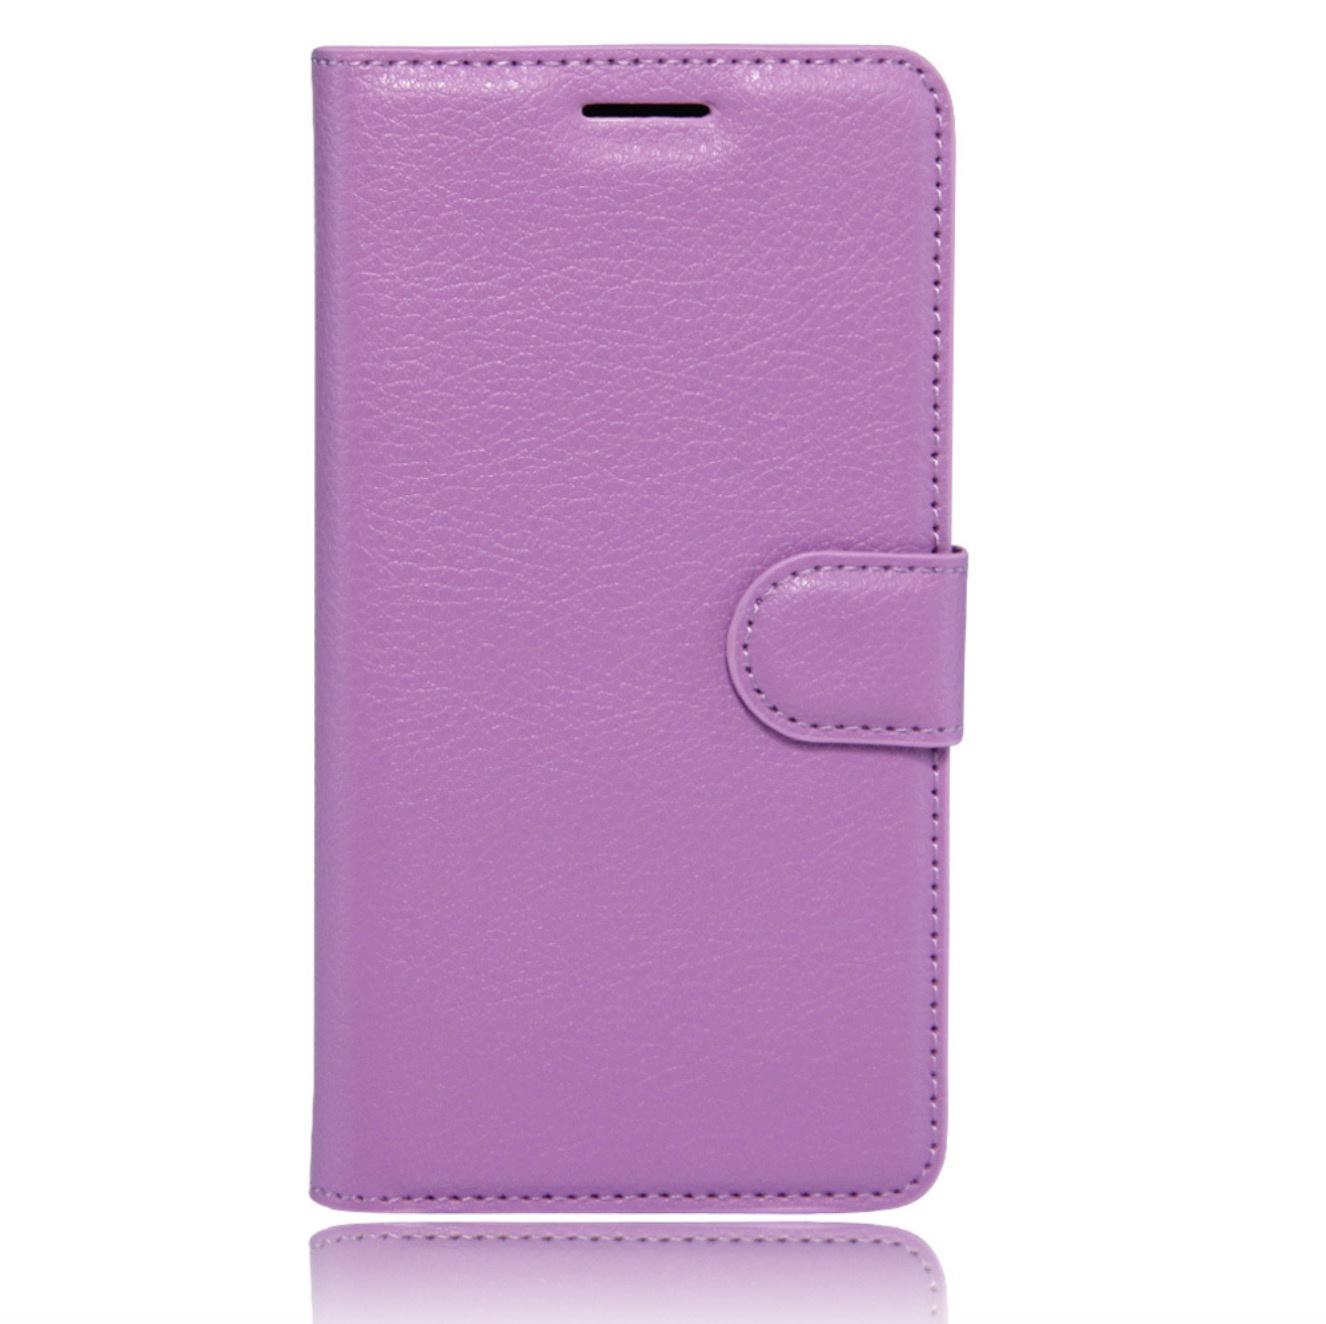 Чехол-книжка MyPads для LG Ray / LG Zone X190 5.5 с мульти-подставкой застёжкой и визитницей фиолетовый